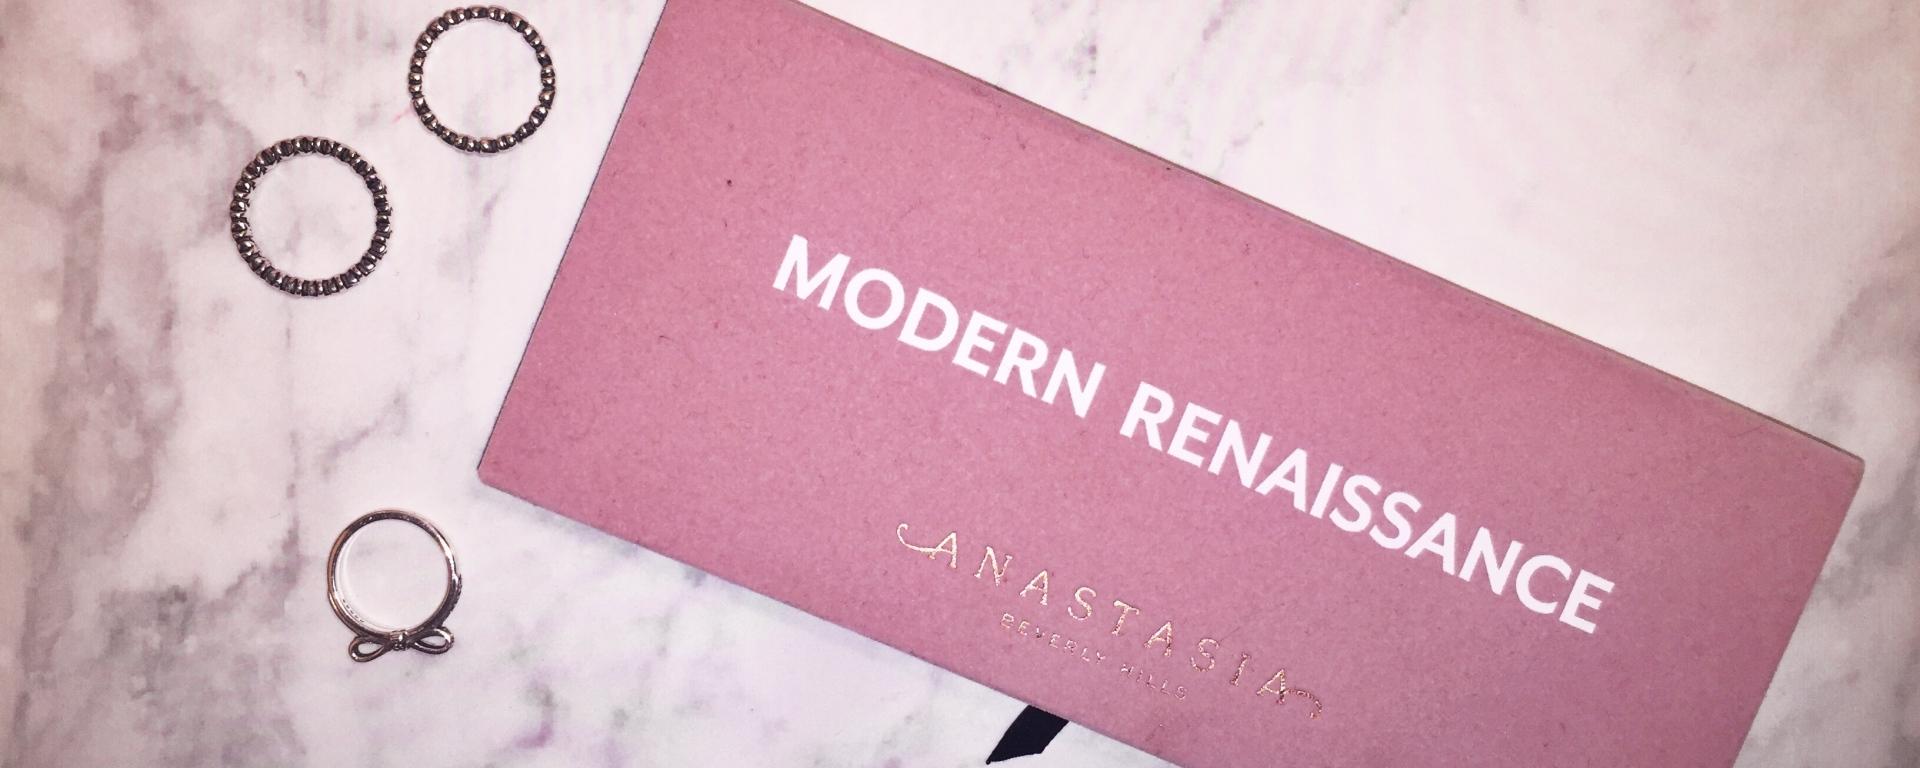 Anastasia Beverly Hills Modern Renaissance Palette Review